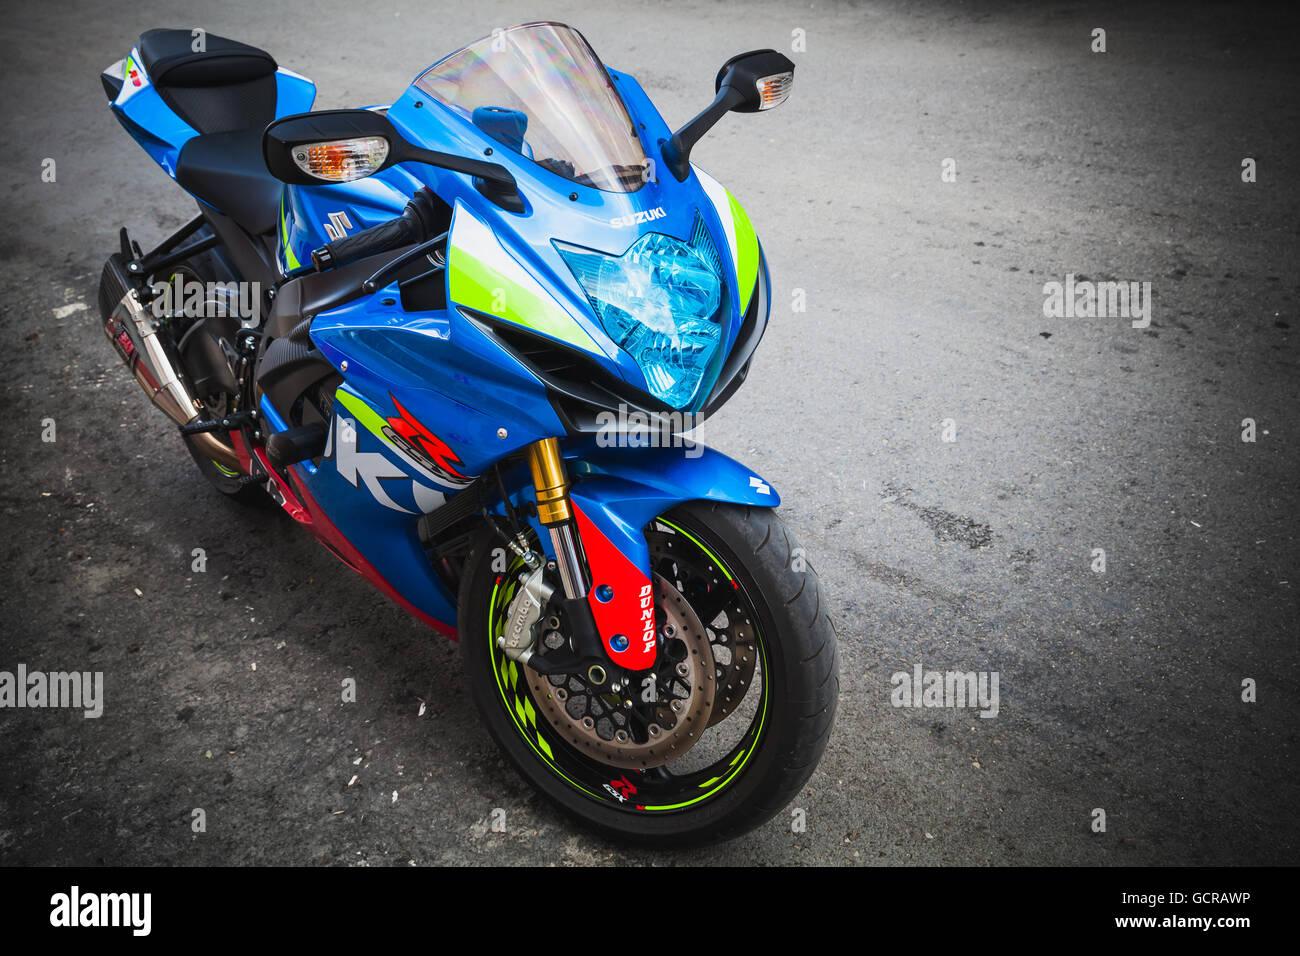 1000cc Motorcycle Stock Photos & 1000cc Motorcycle Stock